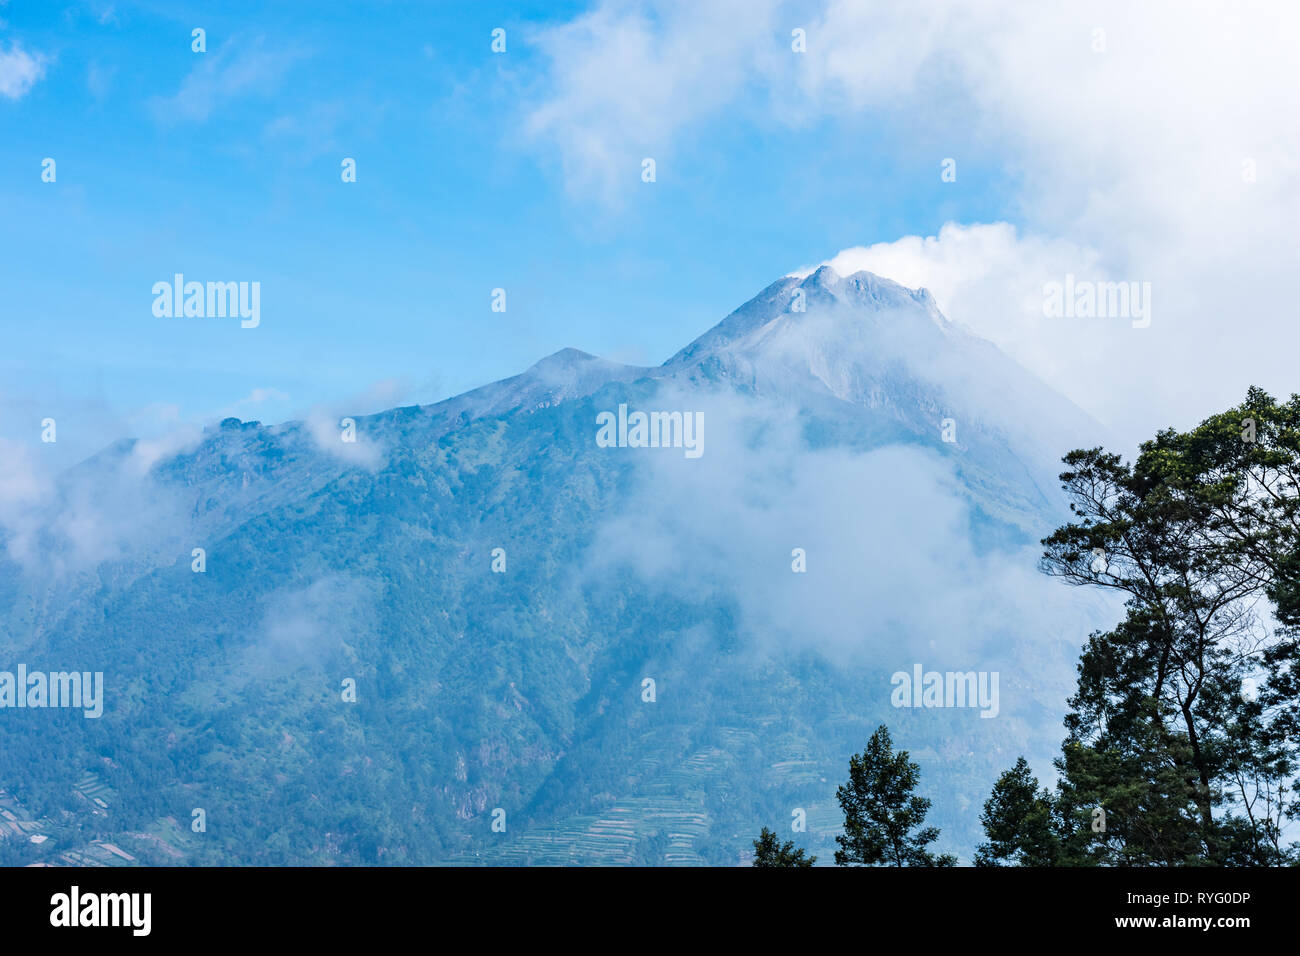 The very active peak of Mount Merapi volcano in Java Indonesia. - Stock Image